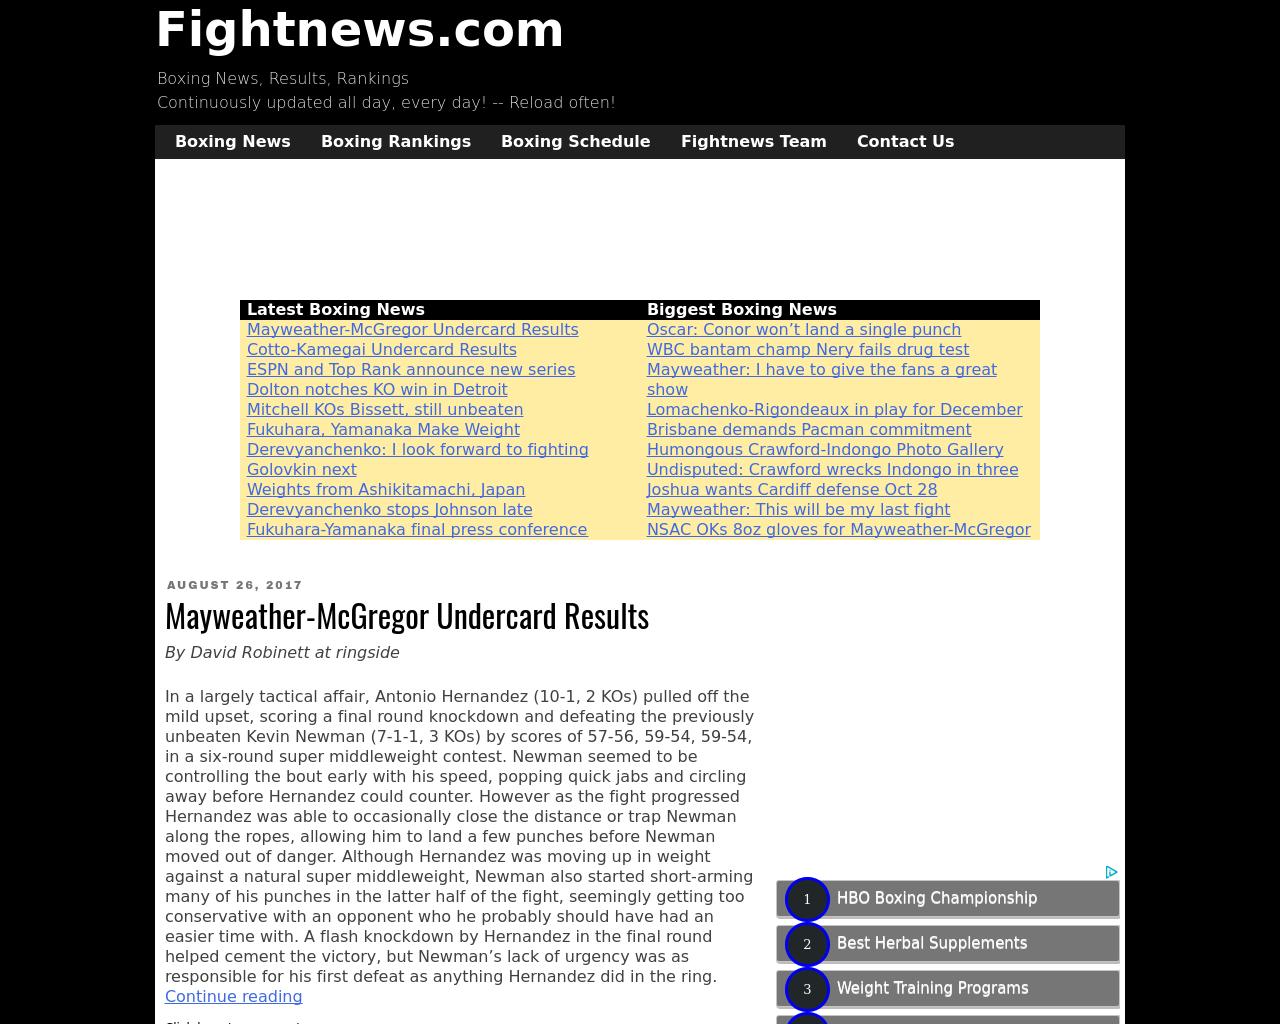 Fightnews.com-Advertising-Reviews-Pricing